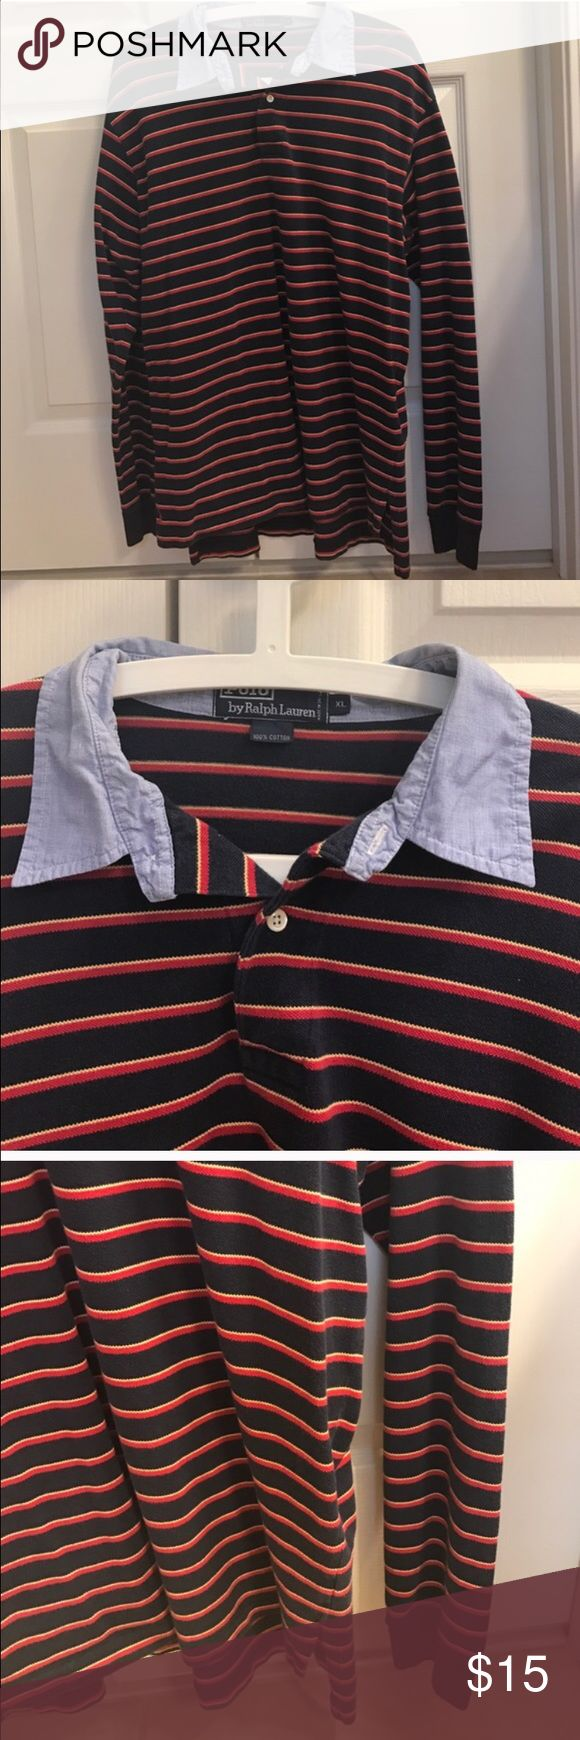 Size Xl Polo Ralph Lauren stripe long sleeve top Size Xl Polo Ralph Lauren stripe long sleeve top Polo by Ralph Lauren Shirts Polos